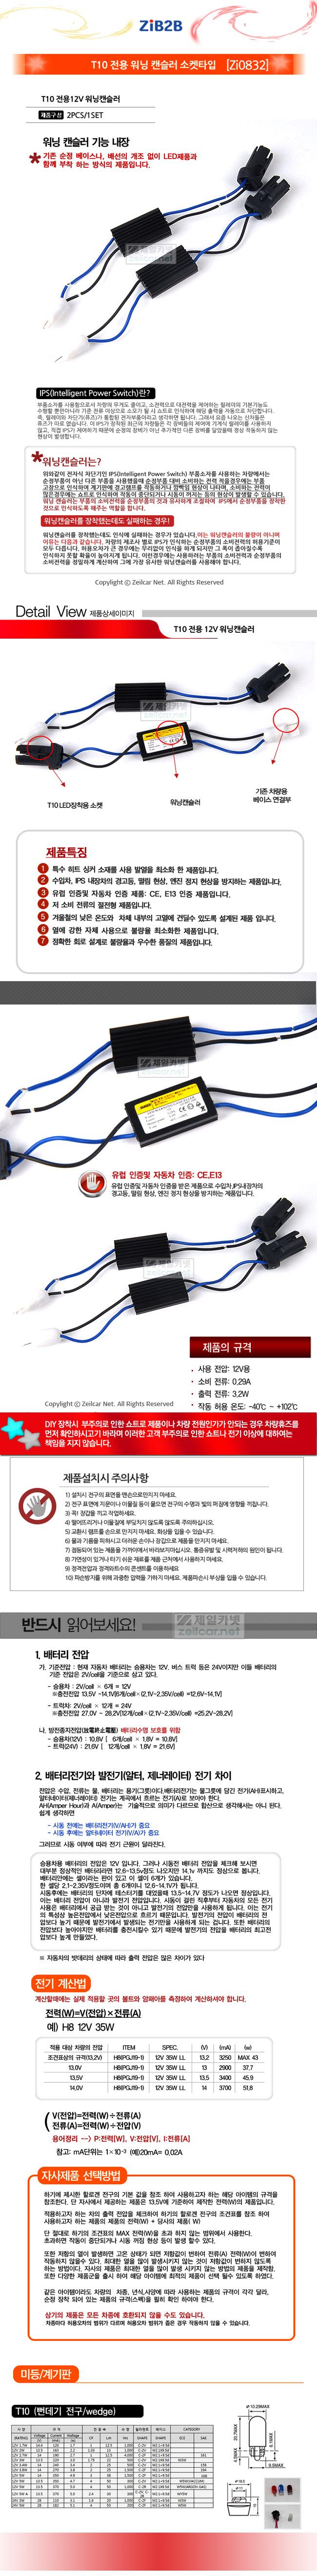 [ZiB2B] T10 전용 워닝캔슬러 소켓 2ea/1set [Zi0832]